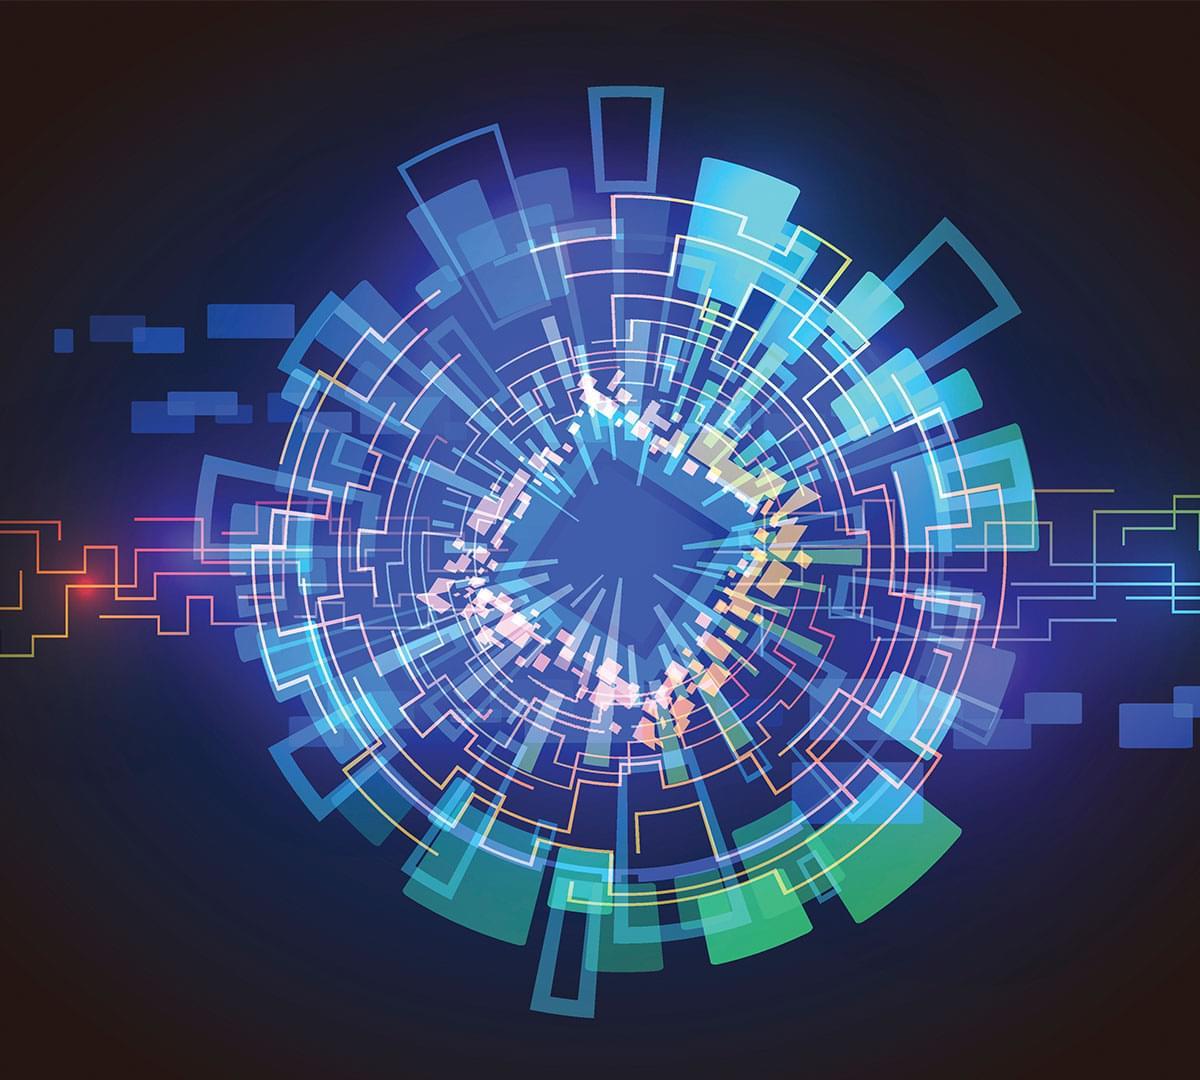 Image Sensors & IS Auto US Online 2020